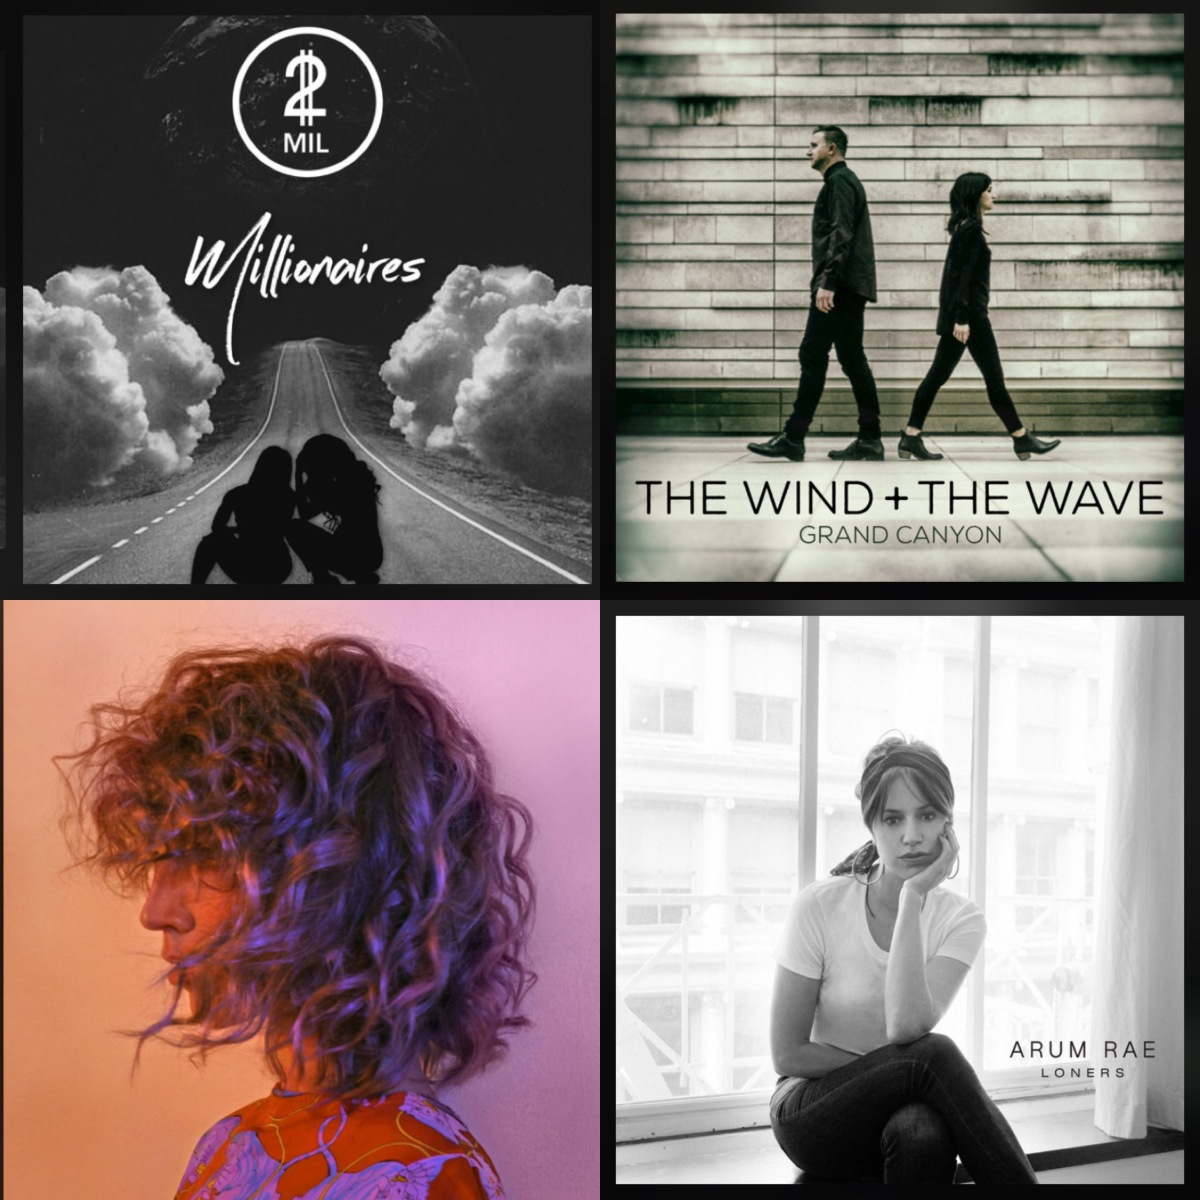 Daily Buzz Tracks: The Wind and The Wave, Myzica, Arum Rae, DJ Snake, 2mil,Maná